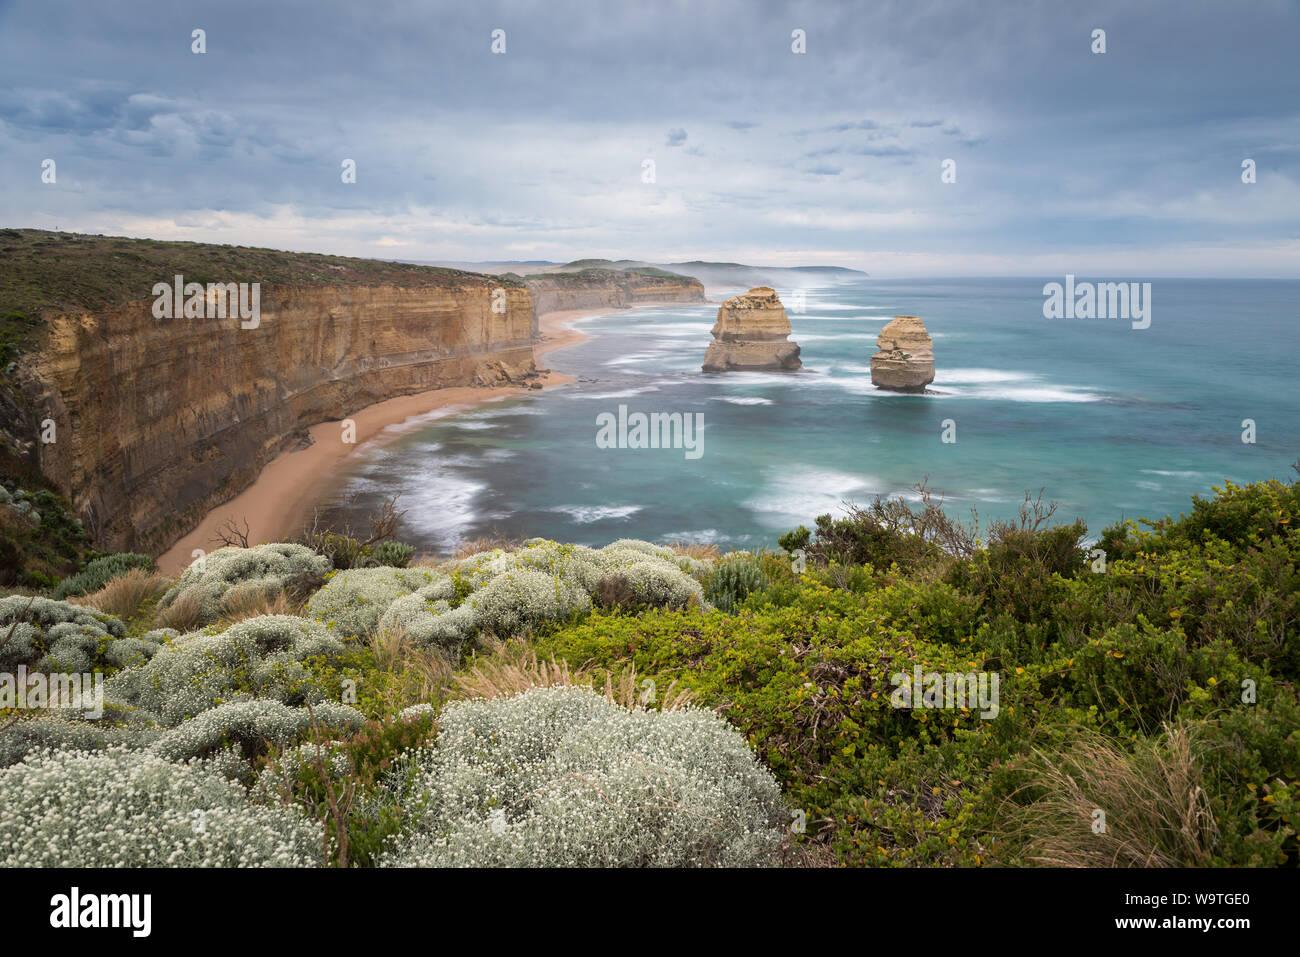 Zwölf Apostel Marine Nationalpark, Victoria, Australien Stockfoto